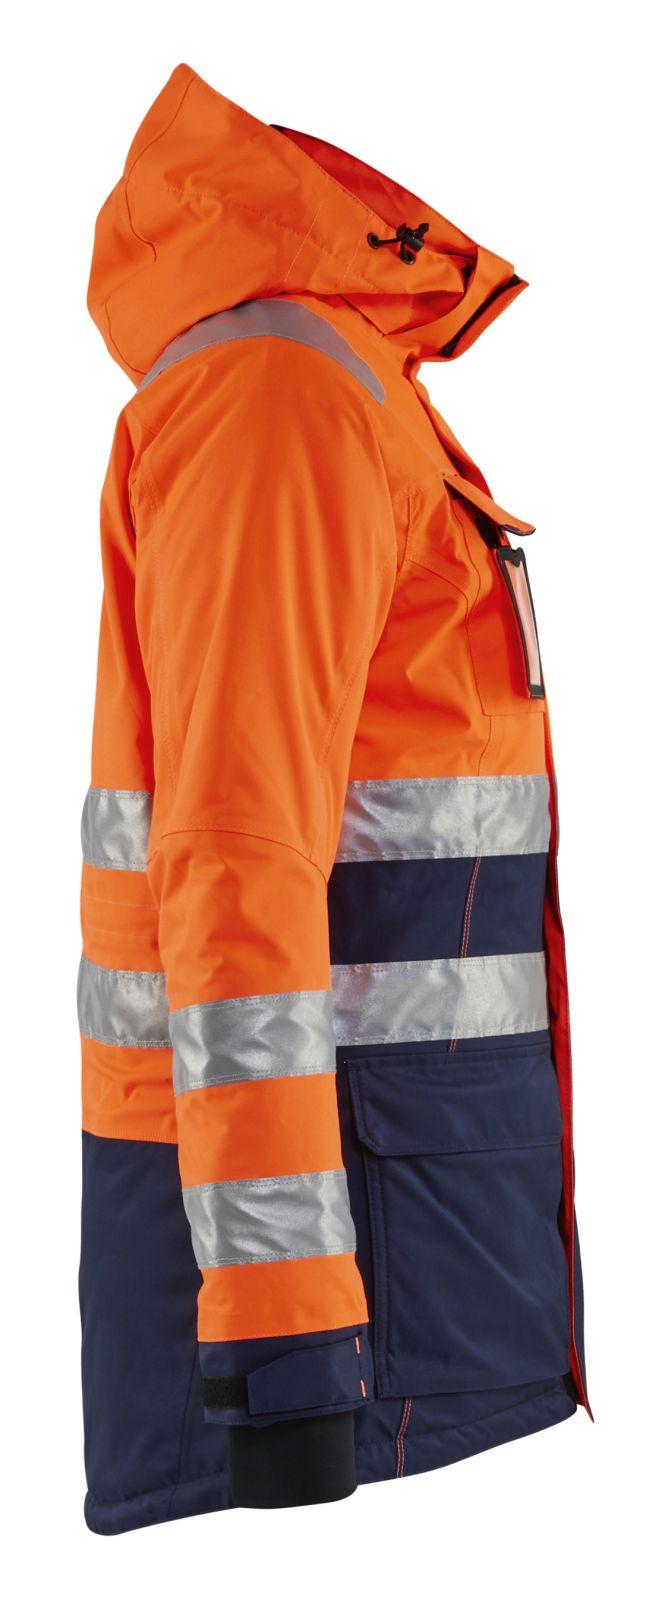 Blaklader Dames winterparka 44721987 High Vis fluo oranje-marineblauw(5389)